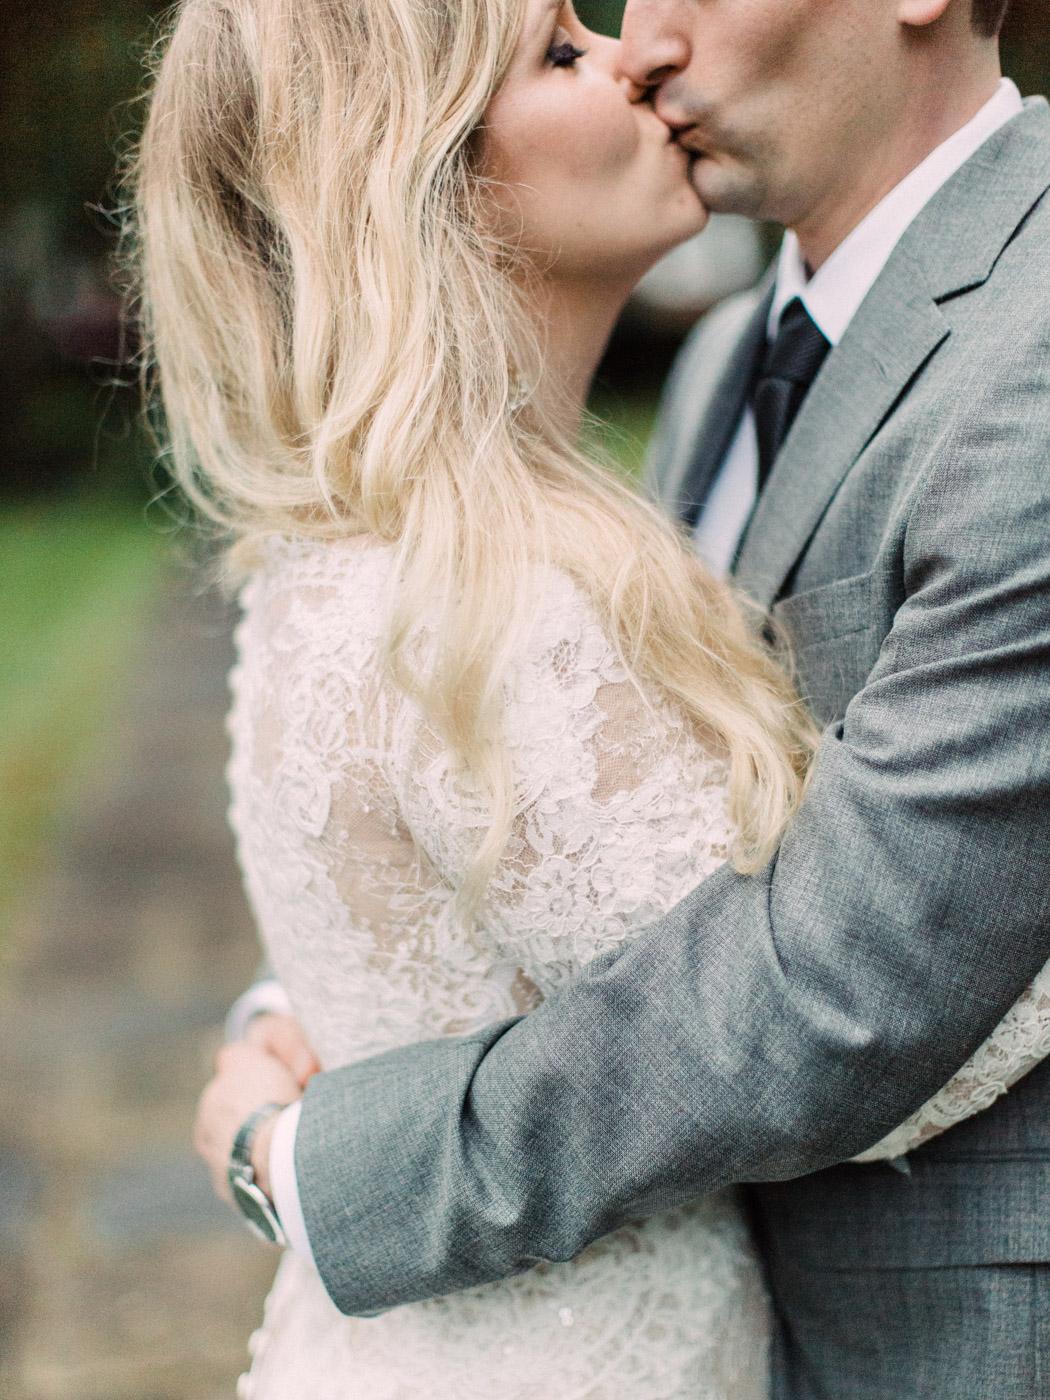 Toronto-wedding-photographer-intimate-classic-fine-art-elopement-ottawa92.jpg